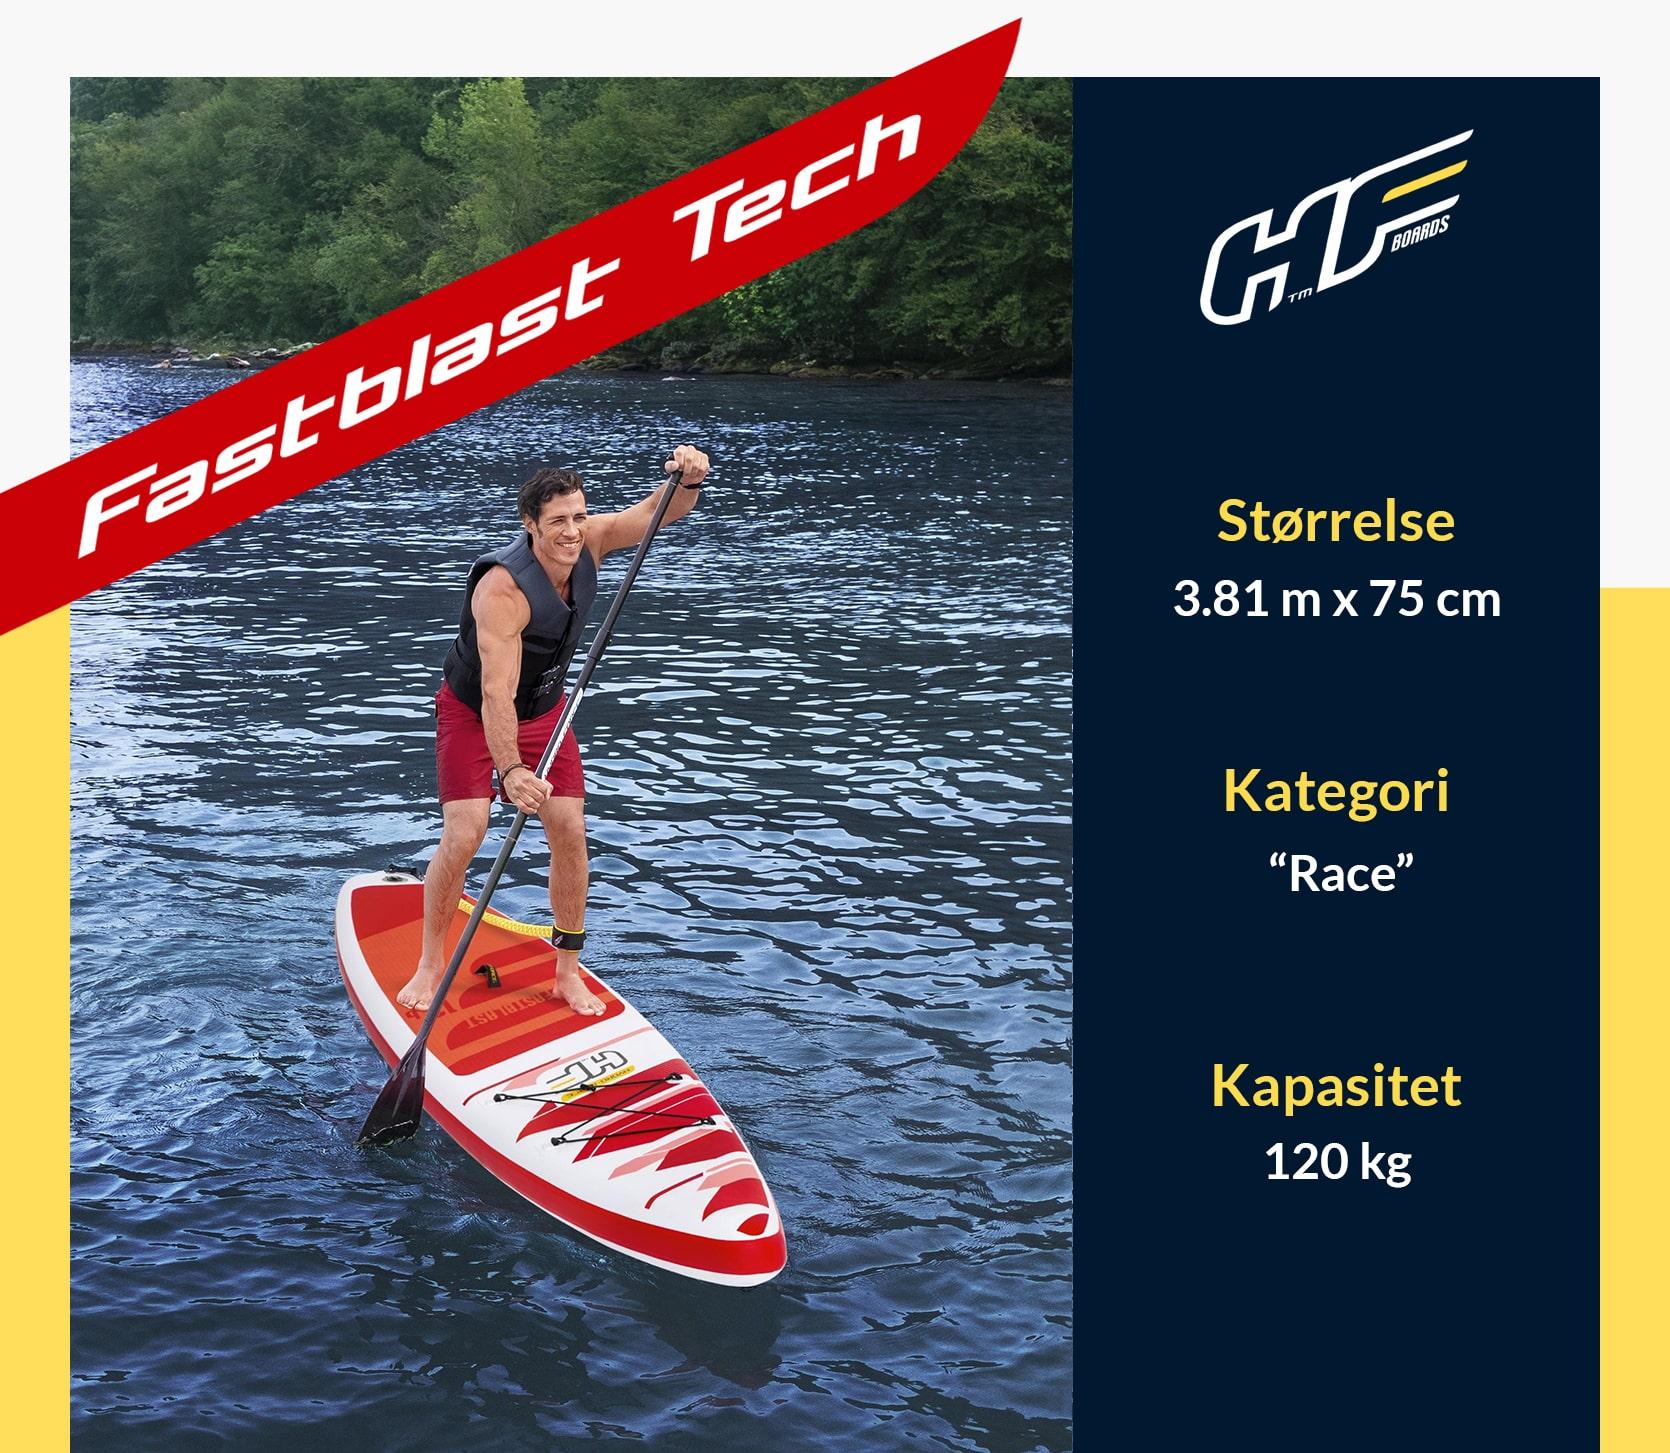 Fastblast Tech Sup brett fra Hydro-Force